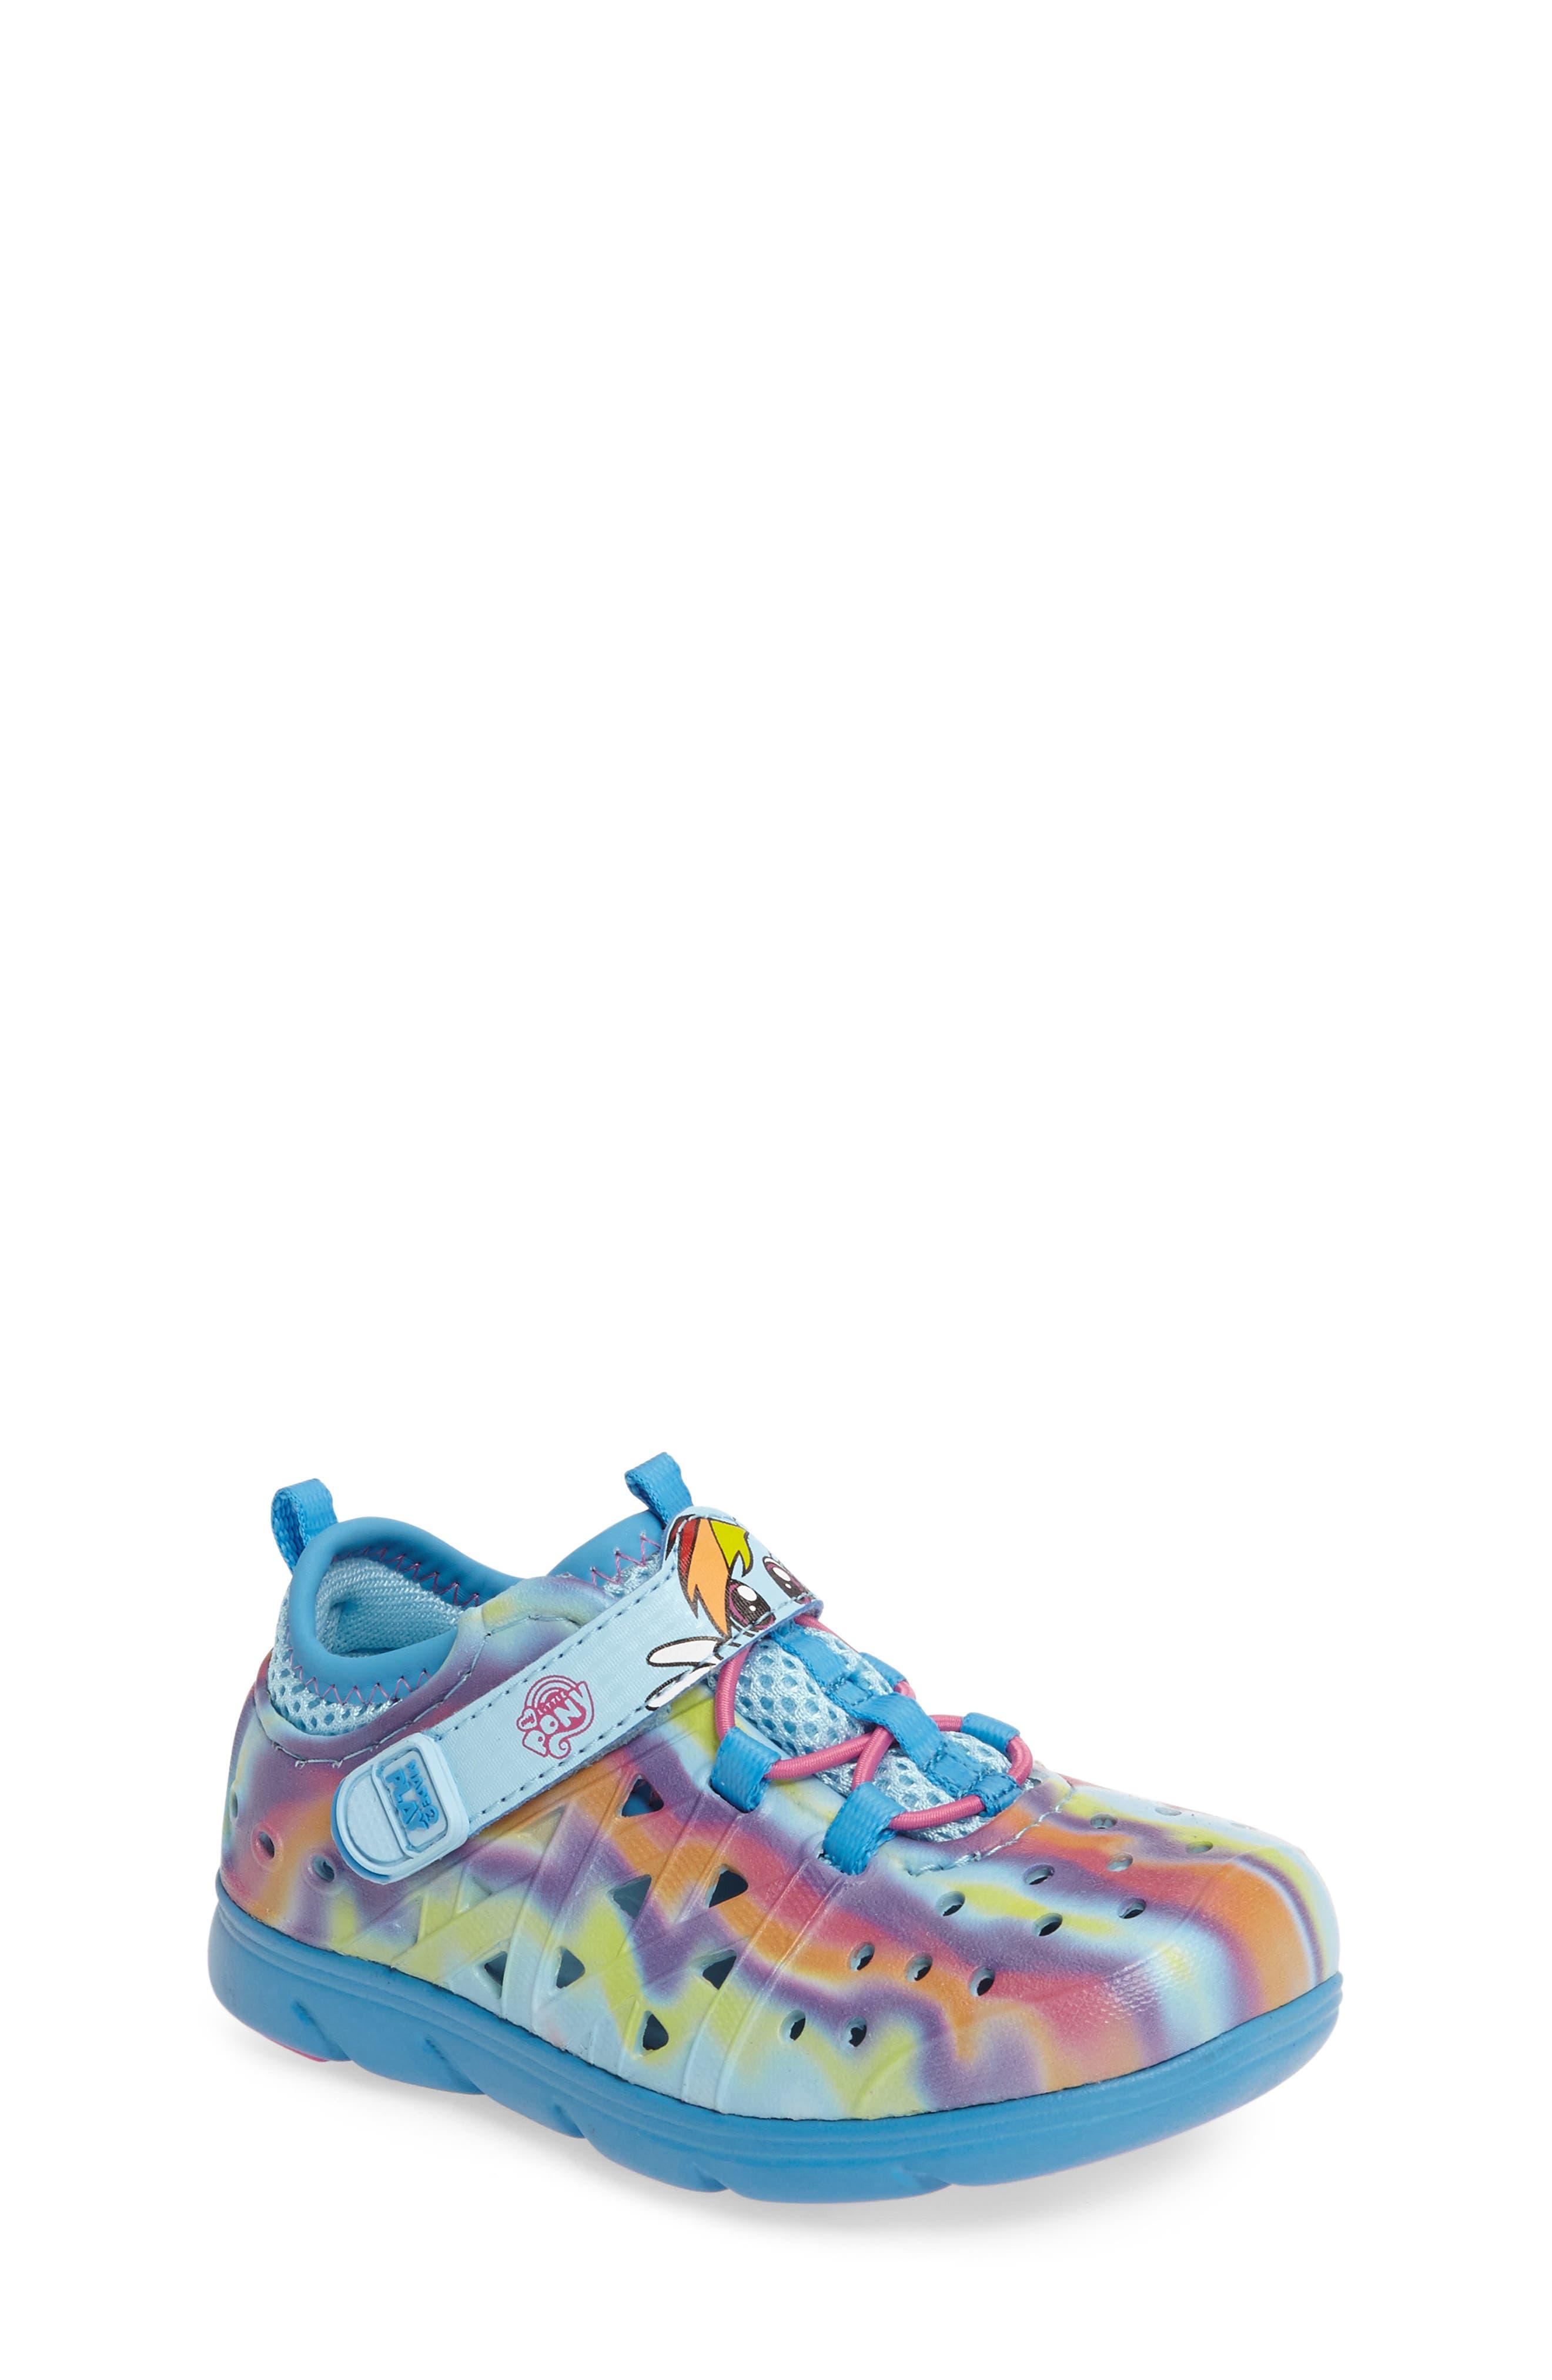 Alternate Image 1 Selected - Stride Rite Made2Play® My Little Pony™ Phibian Sneaker (Baby, Walker, Toddler & Little Kid)